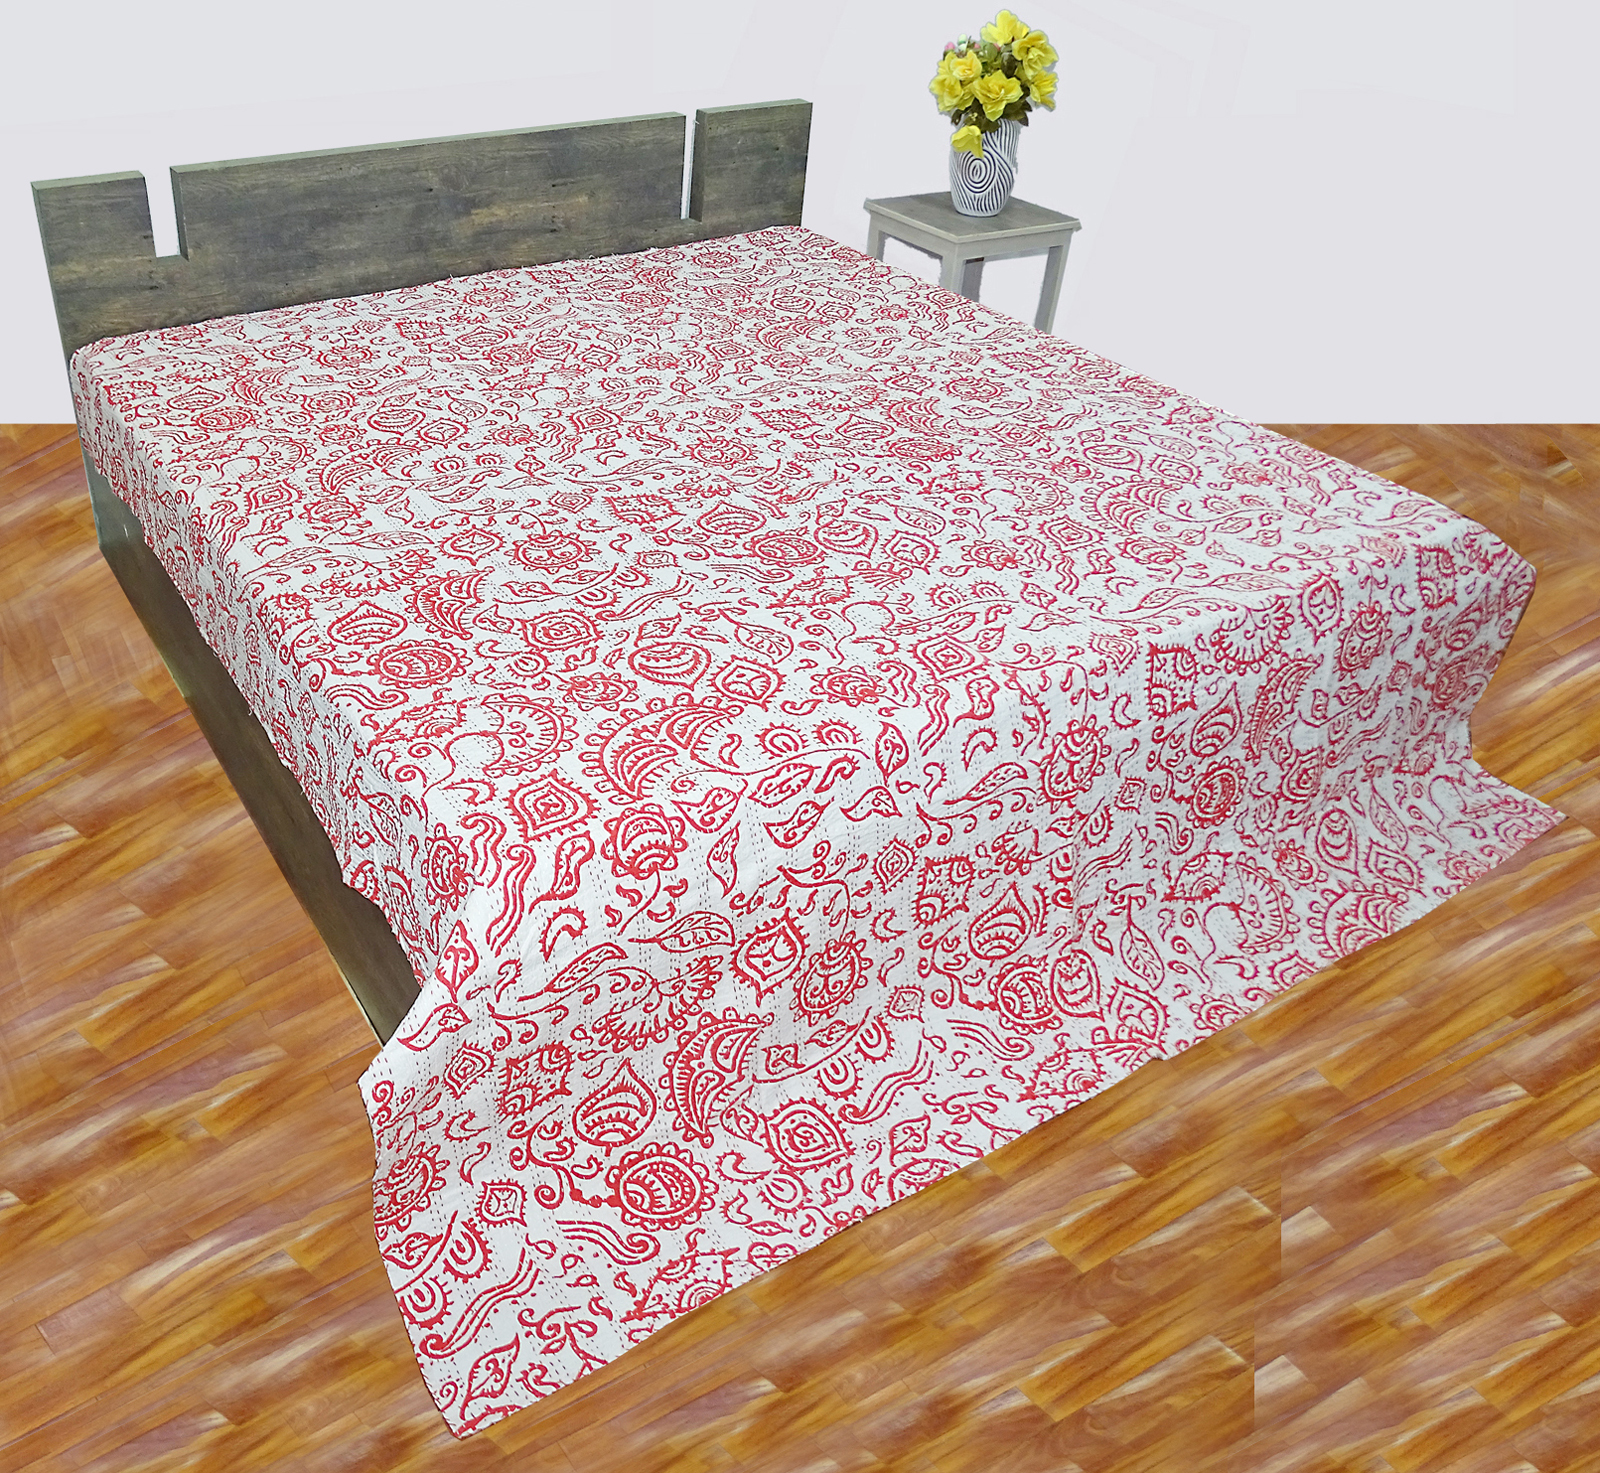 Wholesale Lot Of Cotton Kantha Quilts